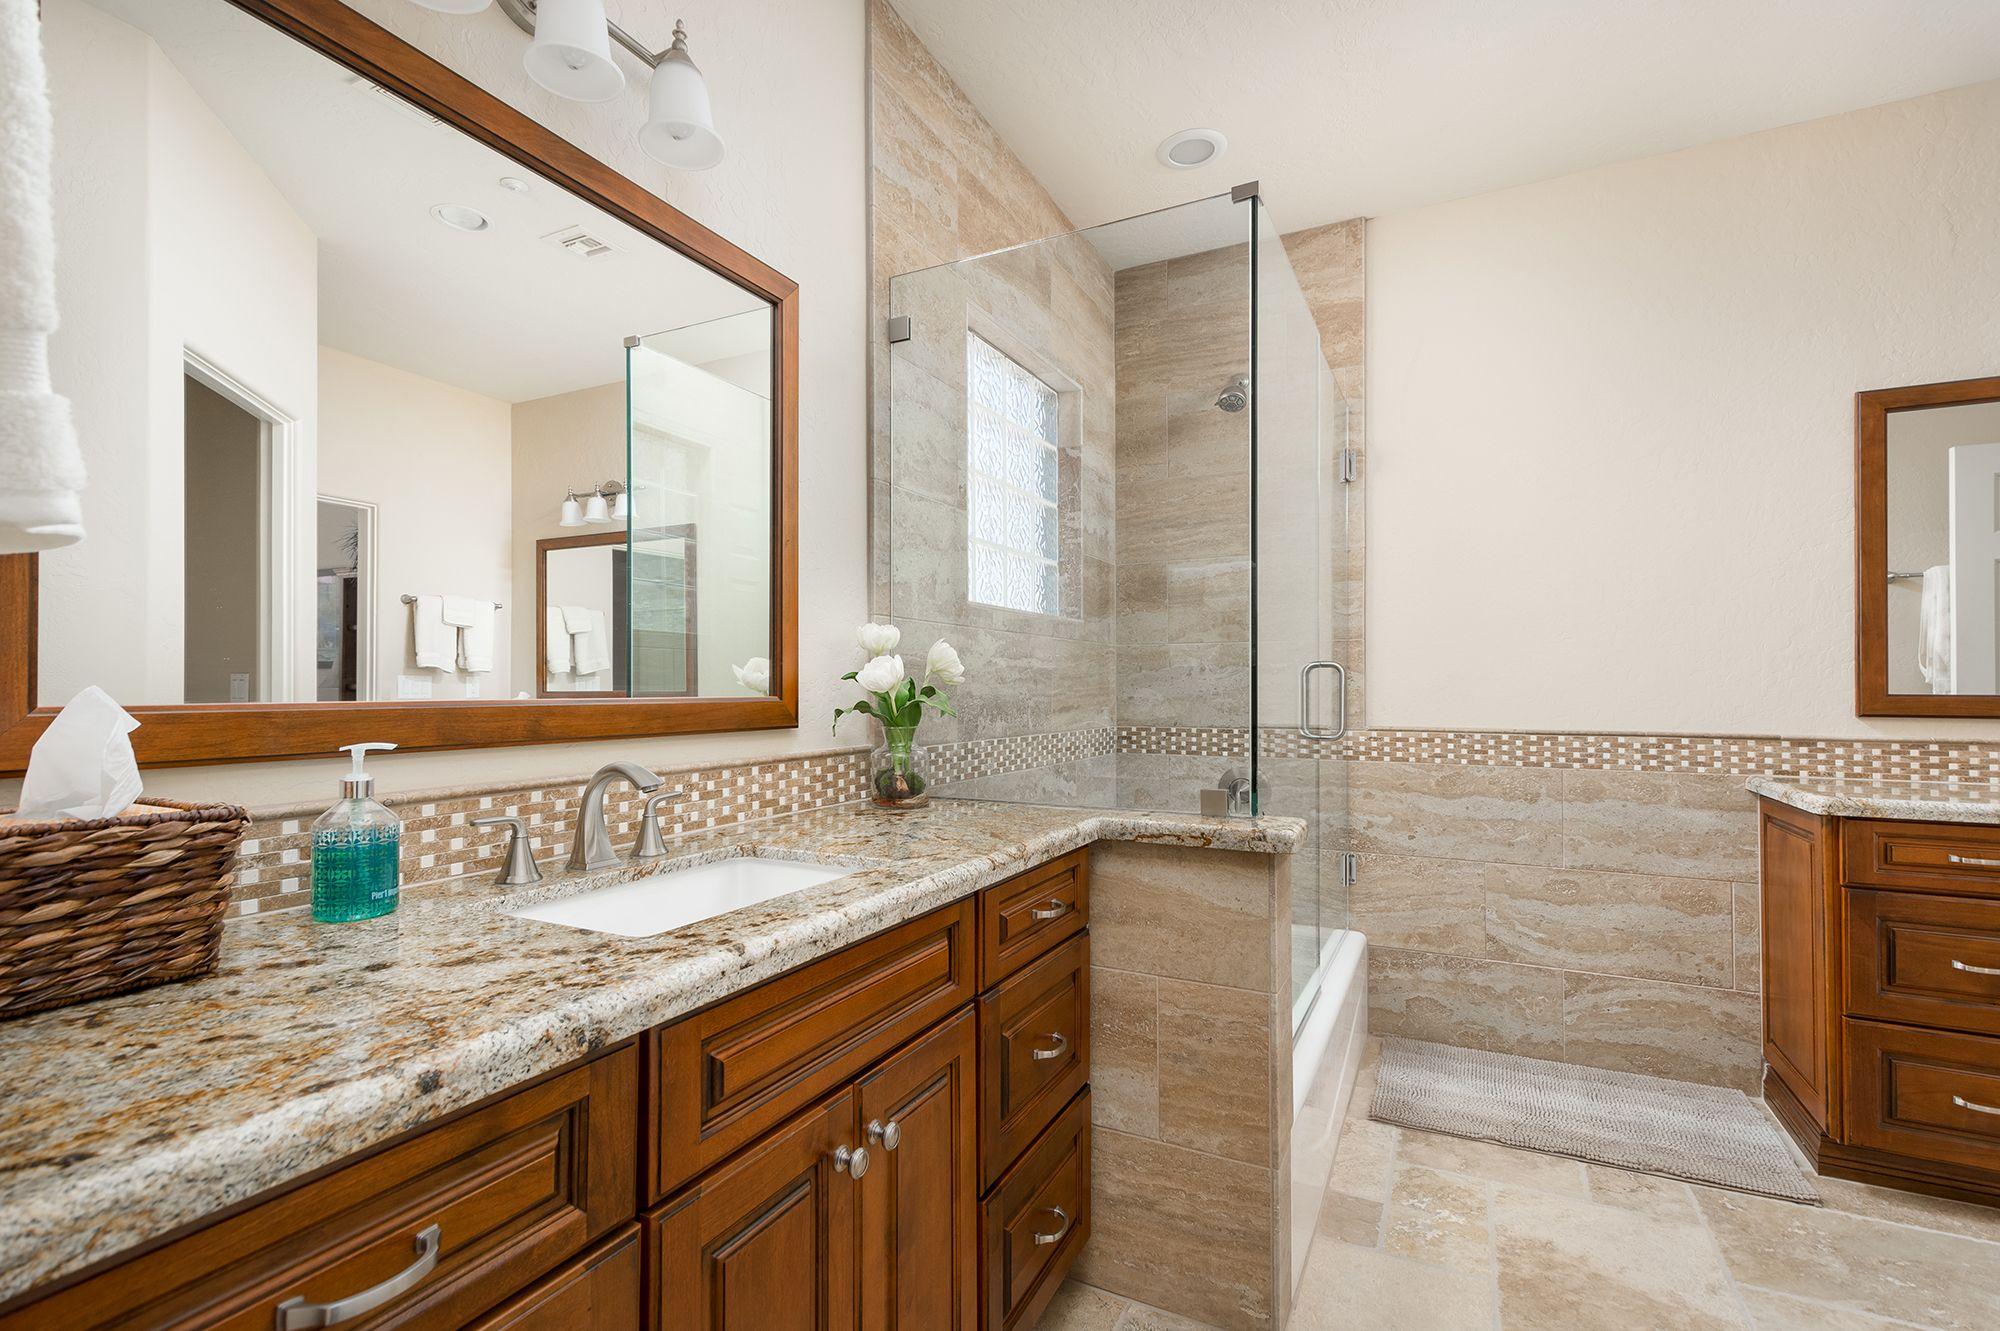 Bathroom Remodeling Fountain Hills Arizona Kitchen Remodel Bathrooms Remodel Remodel [ jpg ]